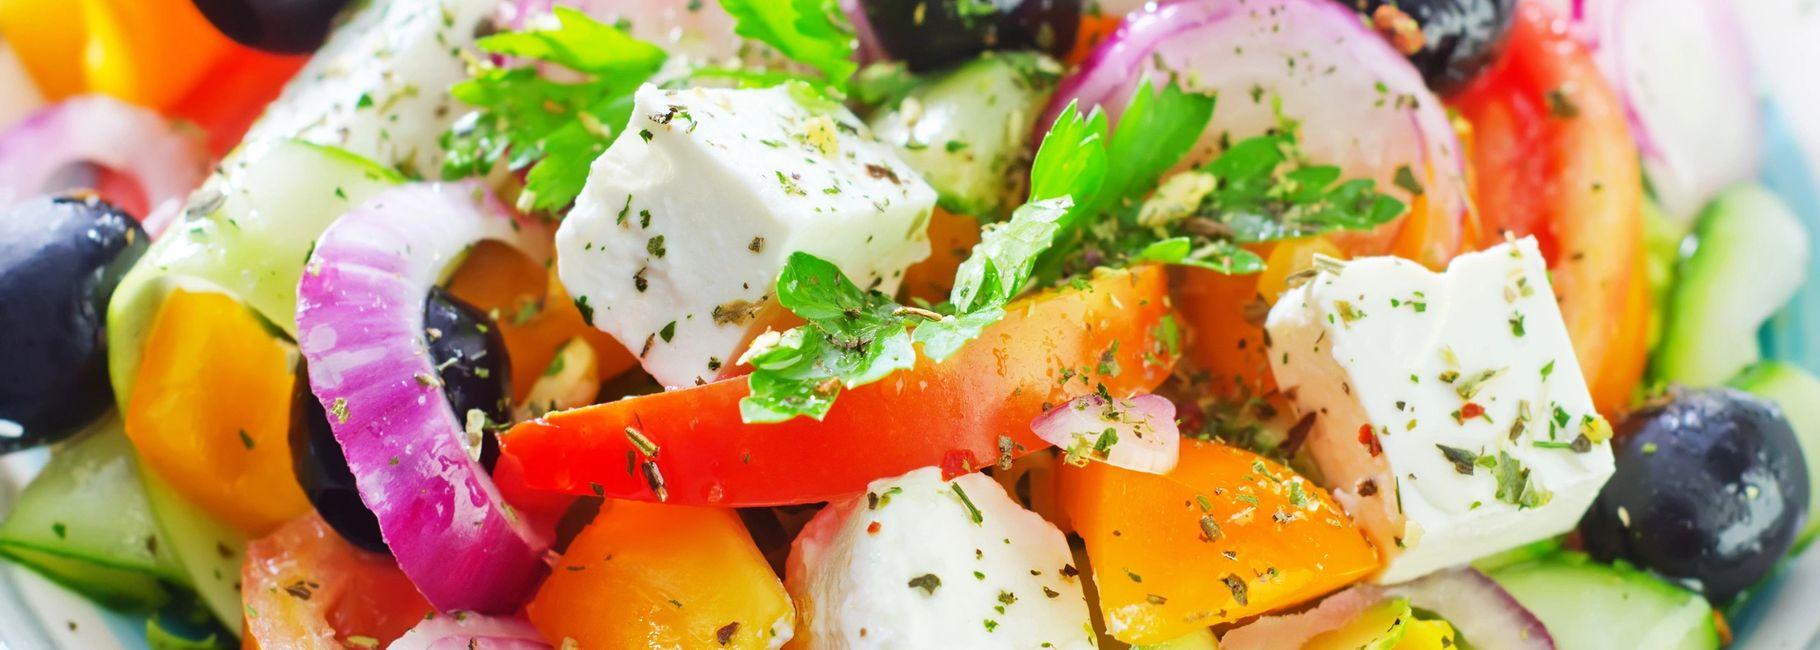 Greek Salad with Oregano Marinated Chicken